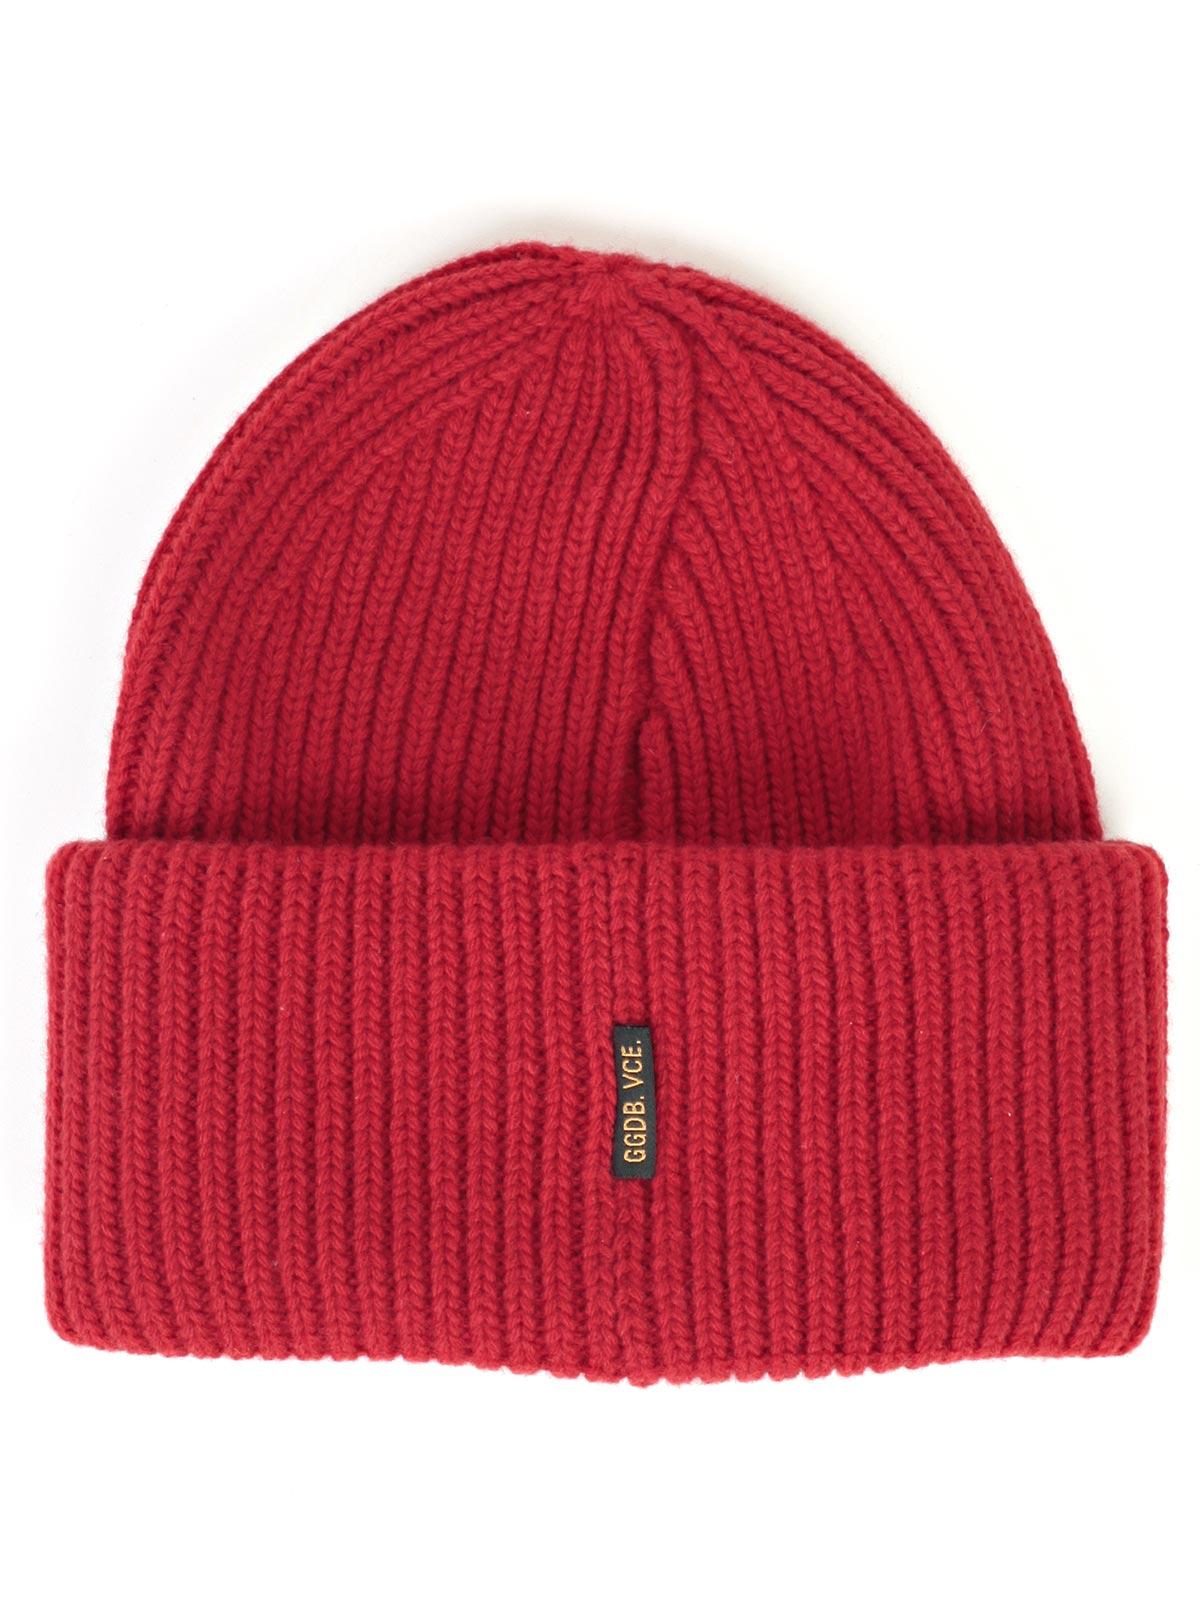 Picture of GOLDEN GOOSE DELUXE BRAND HAT